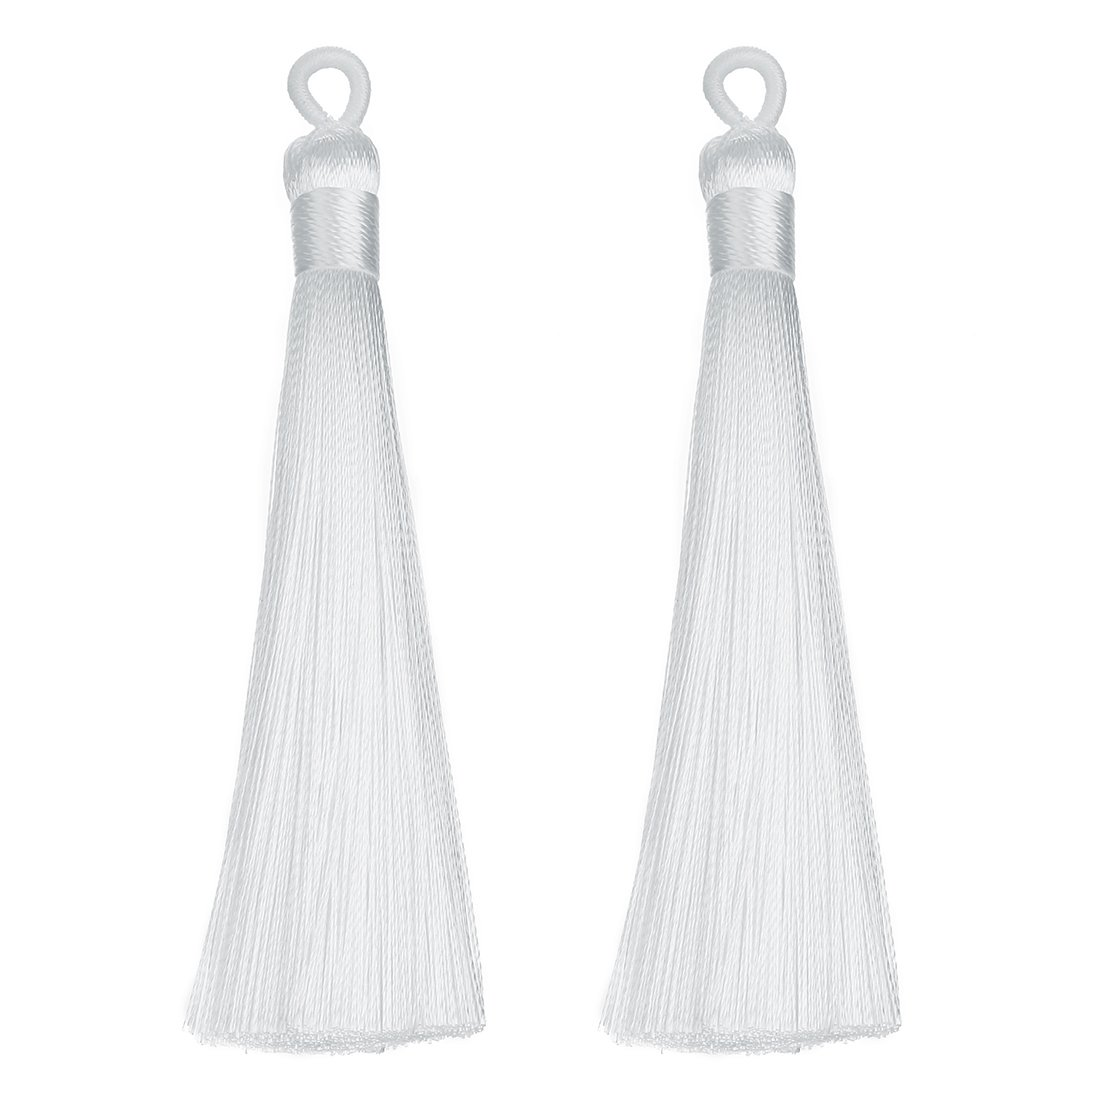 Linsoir Beads 3.5 Long Loop Silk Tassels with Solid Binding Handmade Decorative Tassels Jewelry Tassels Adornments Passementerie 10 pcs//lot